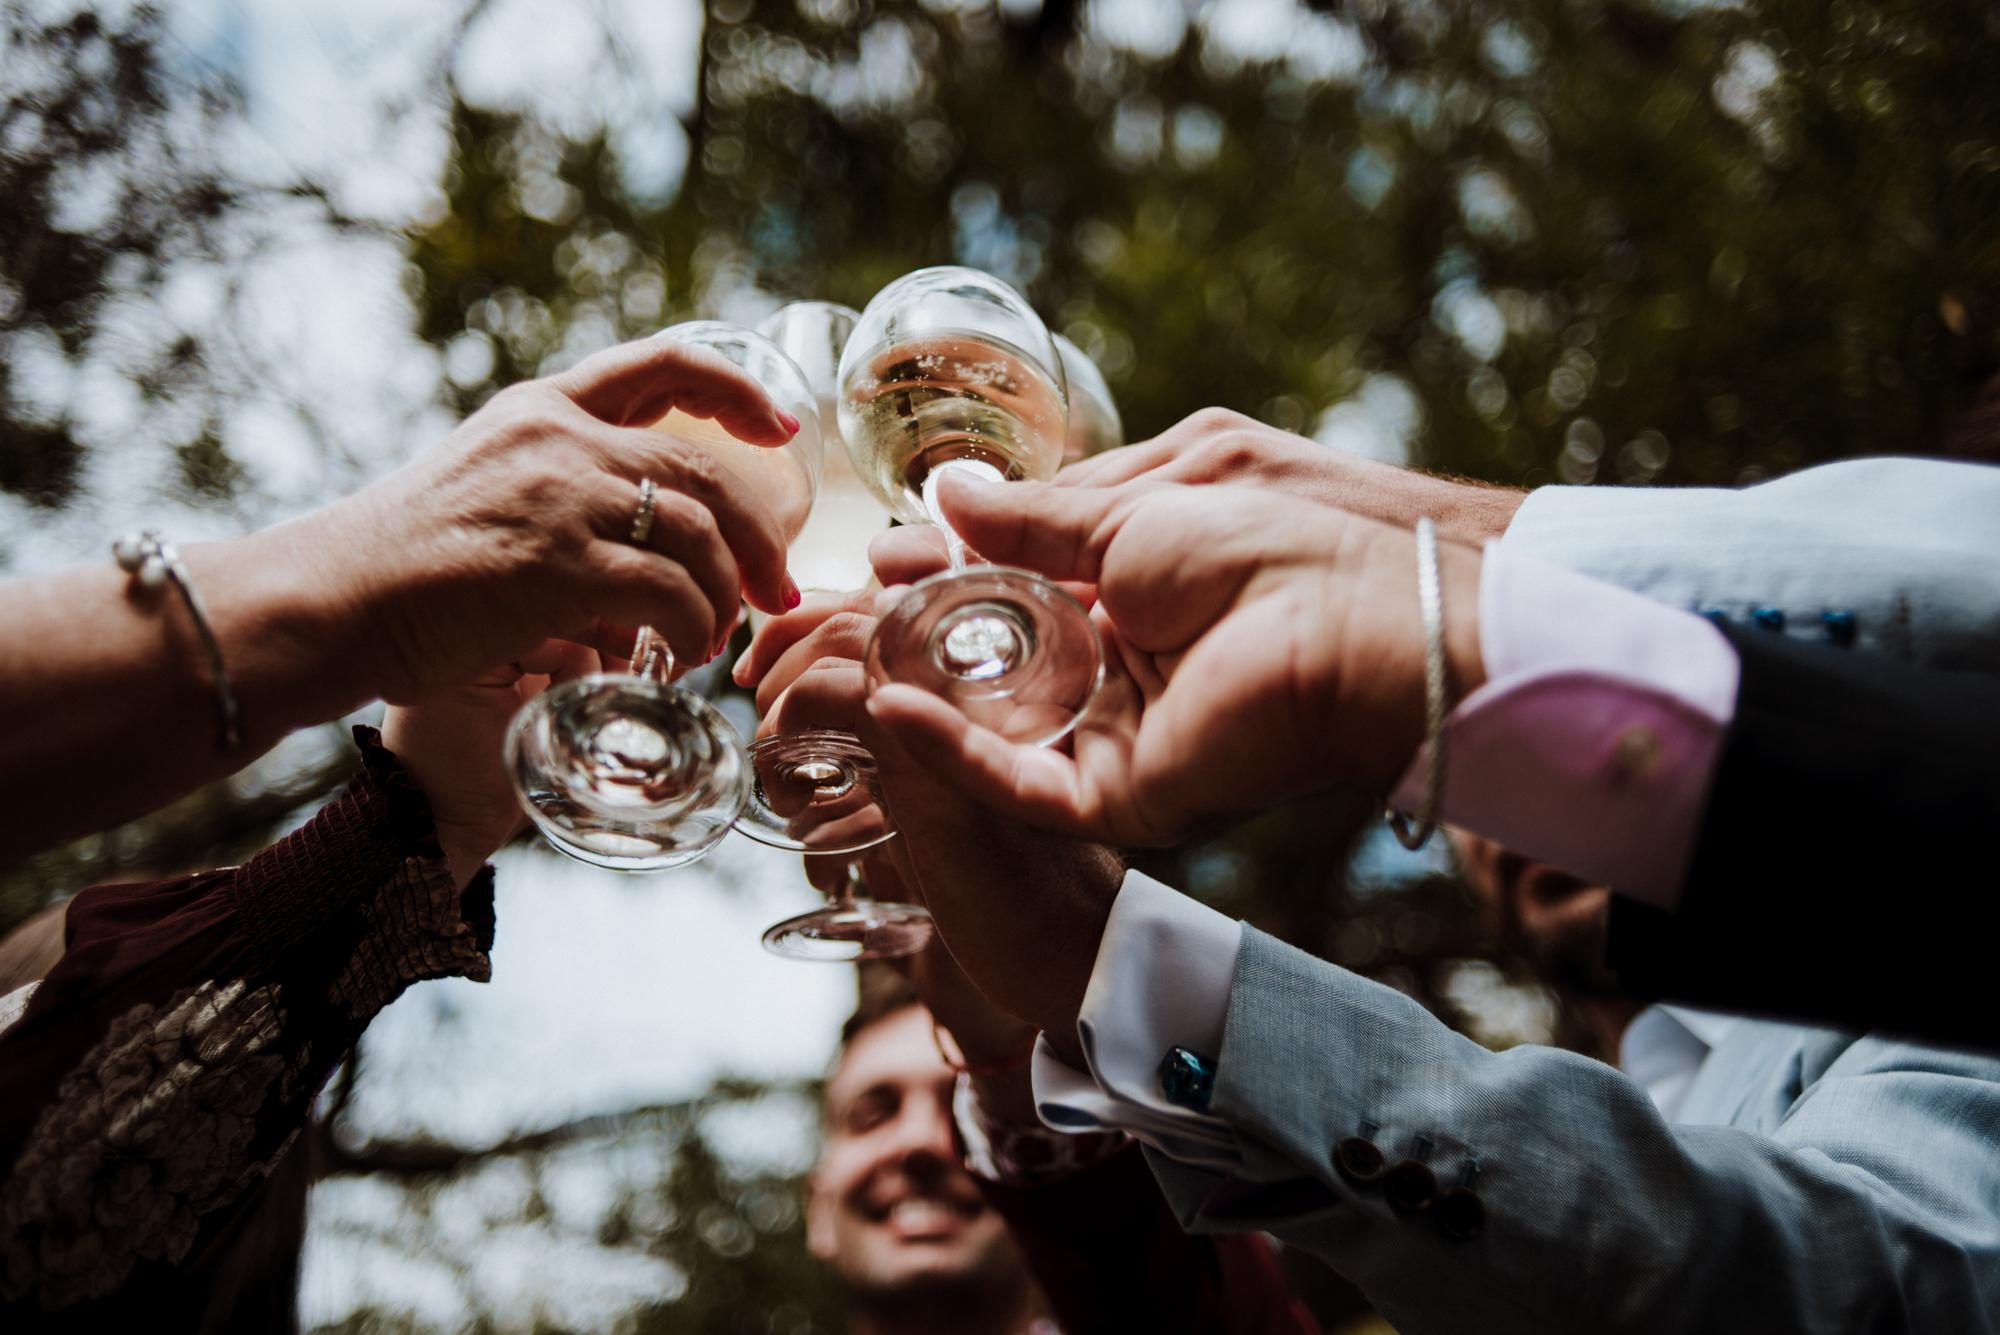 jessica-howard-photography-sean-alessandro-wedding-day-web-150.jpg